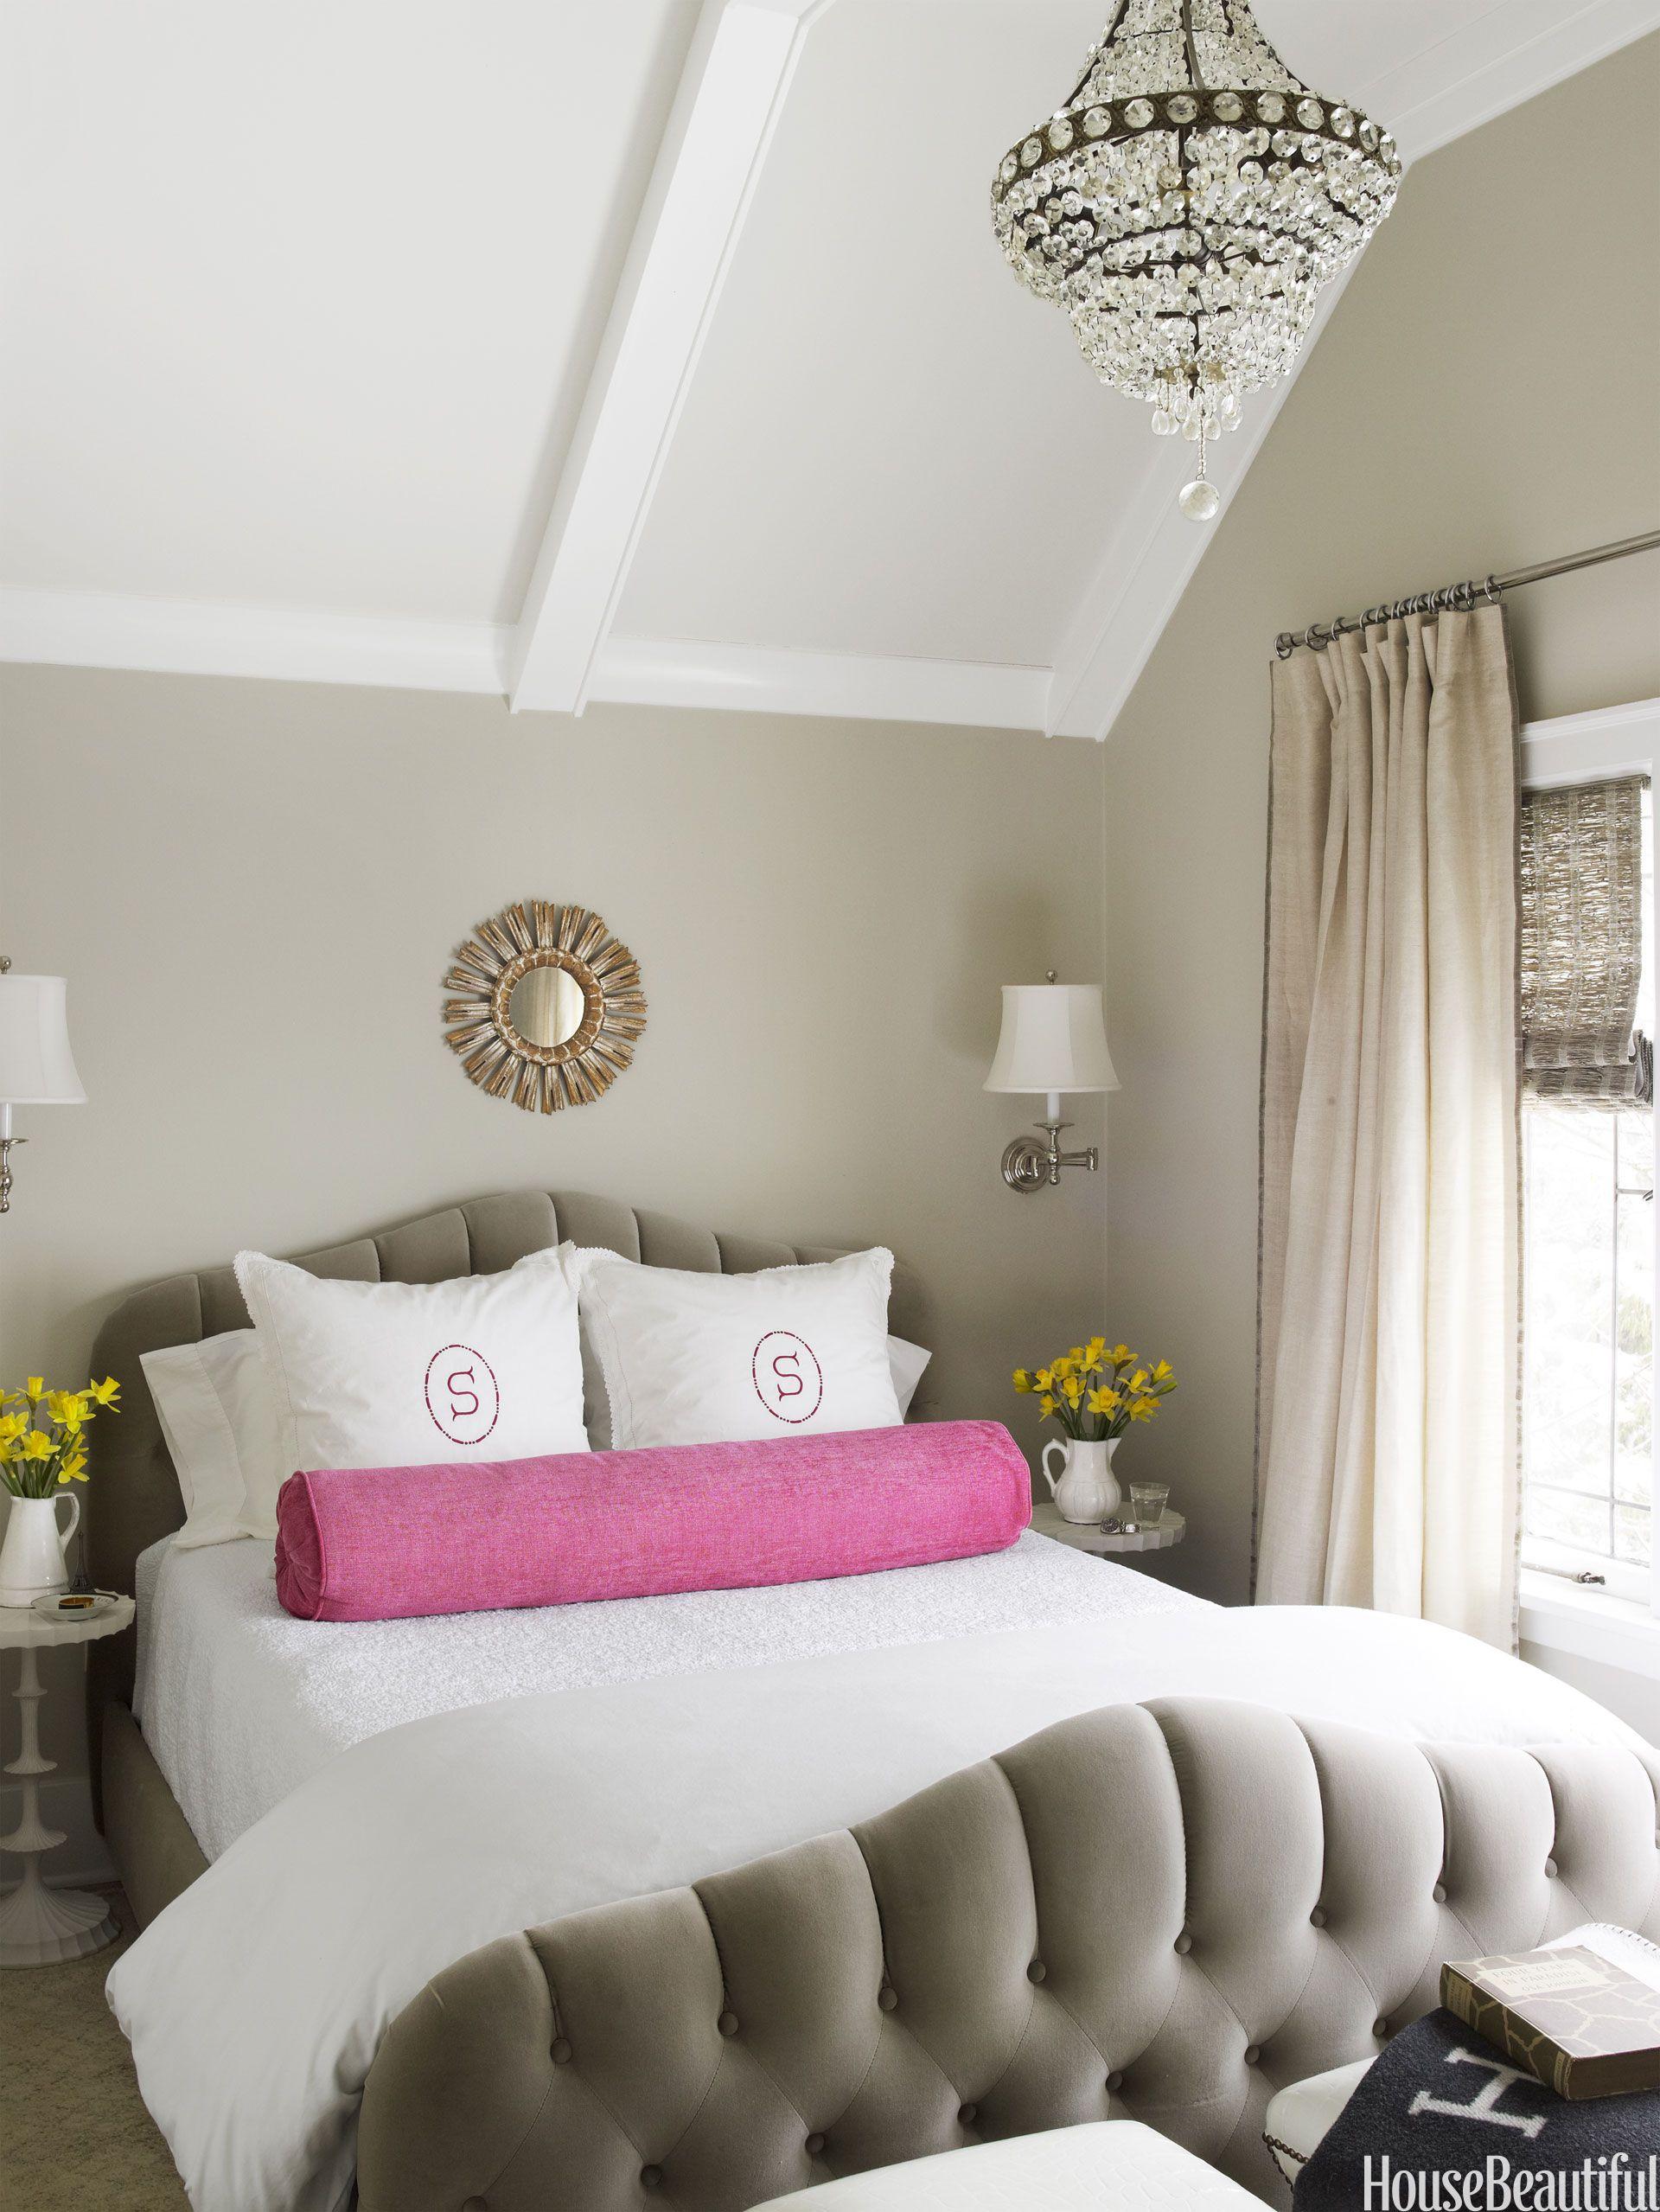 hot bedroom designs.  12 Romantic Bedrooms Ideas for Sexy Bedroom Decor